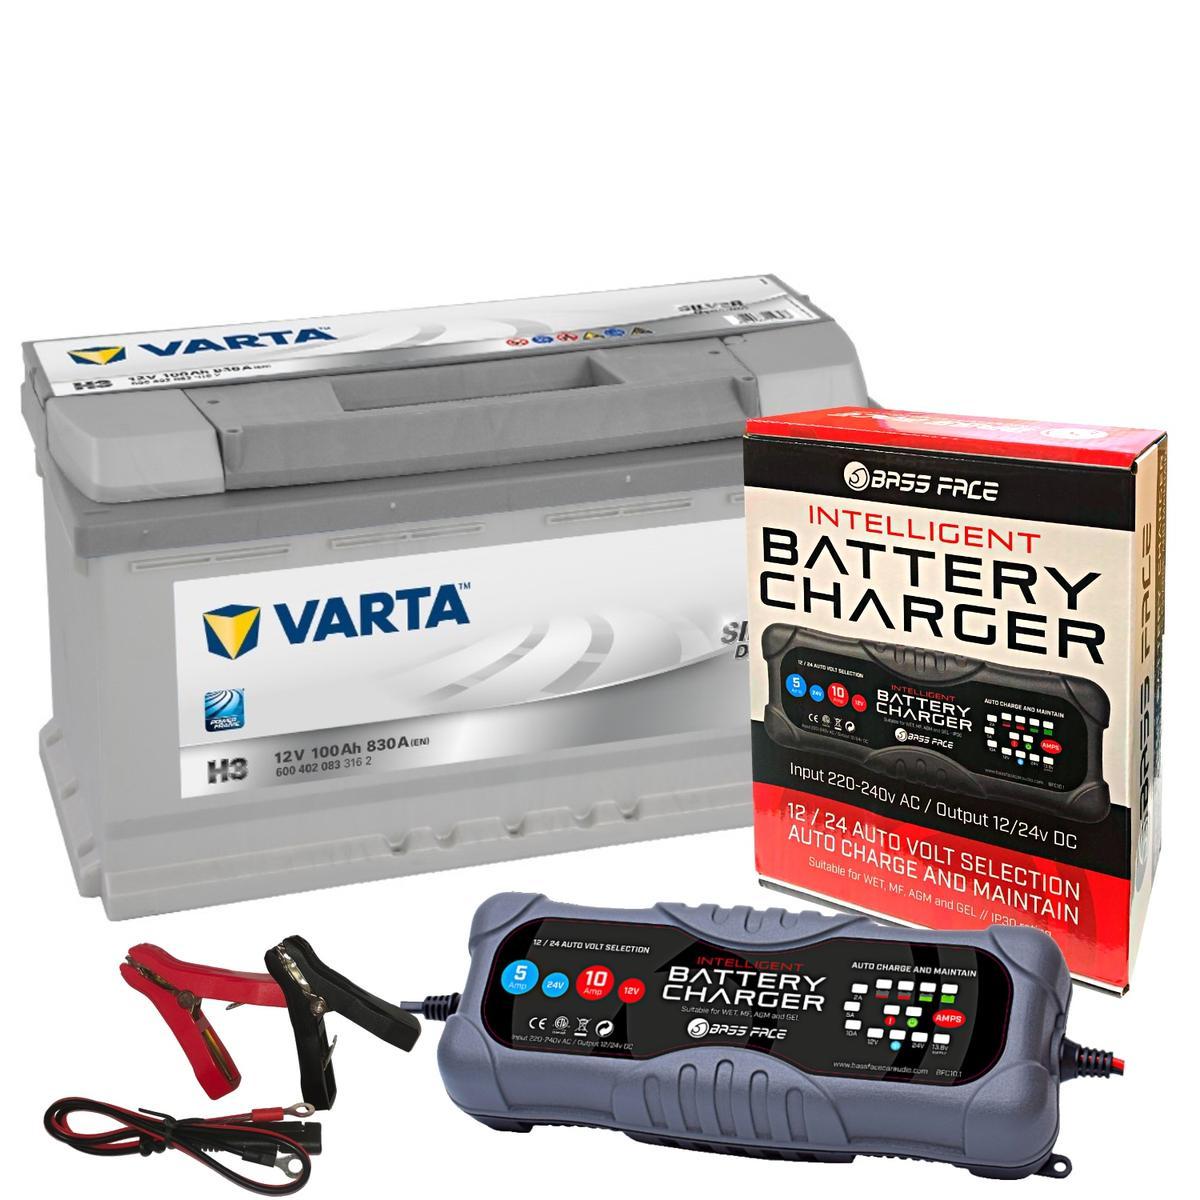 Varta H3 BMW Fiat Merc Car Battery 12v 5 Year 019 100Ah 830CCA W/ 10 Amp Charger